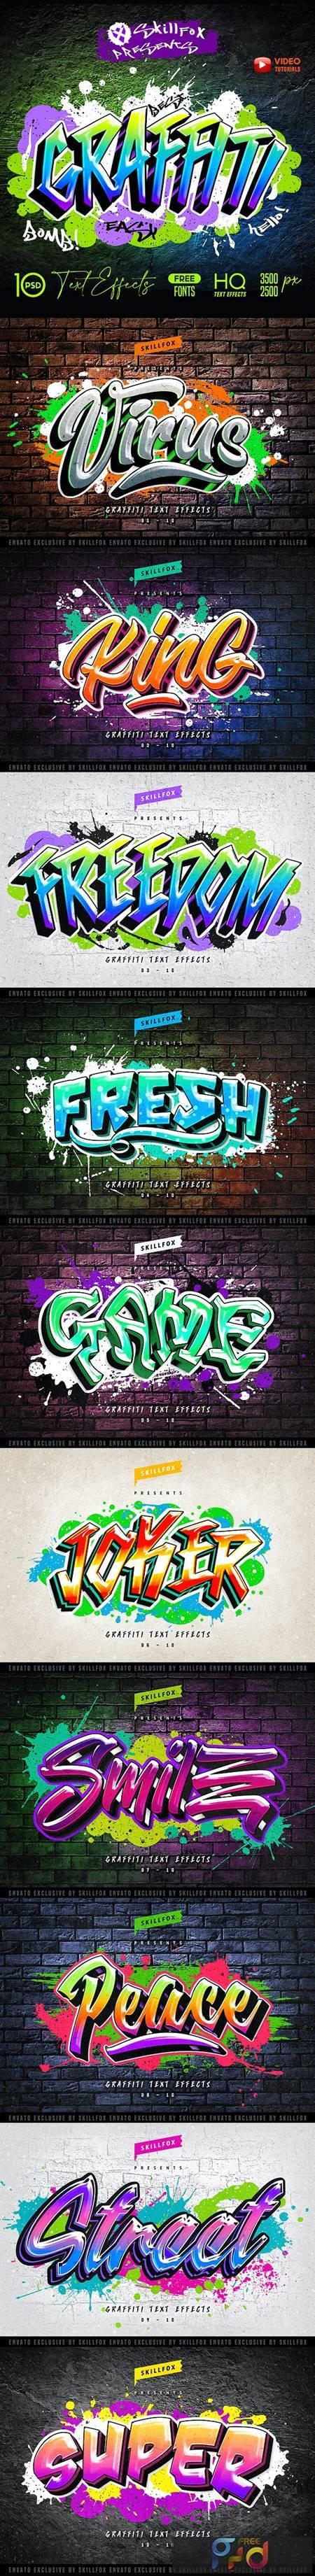 Graffiti Text Effects 27541101 1